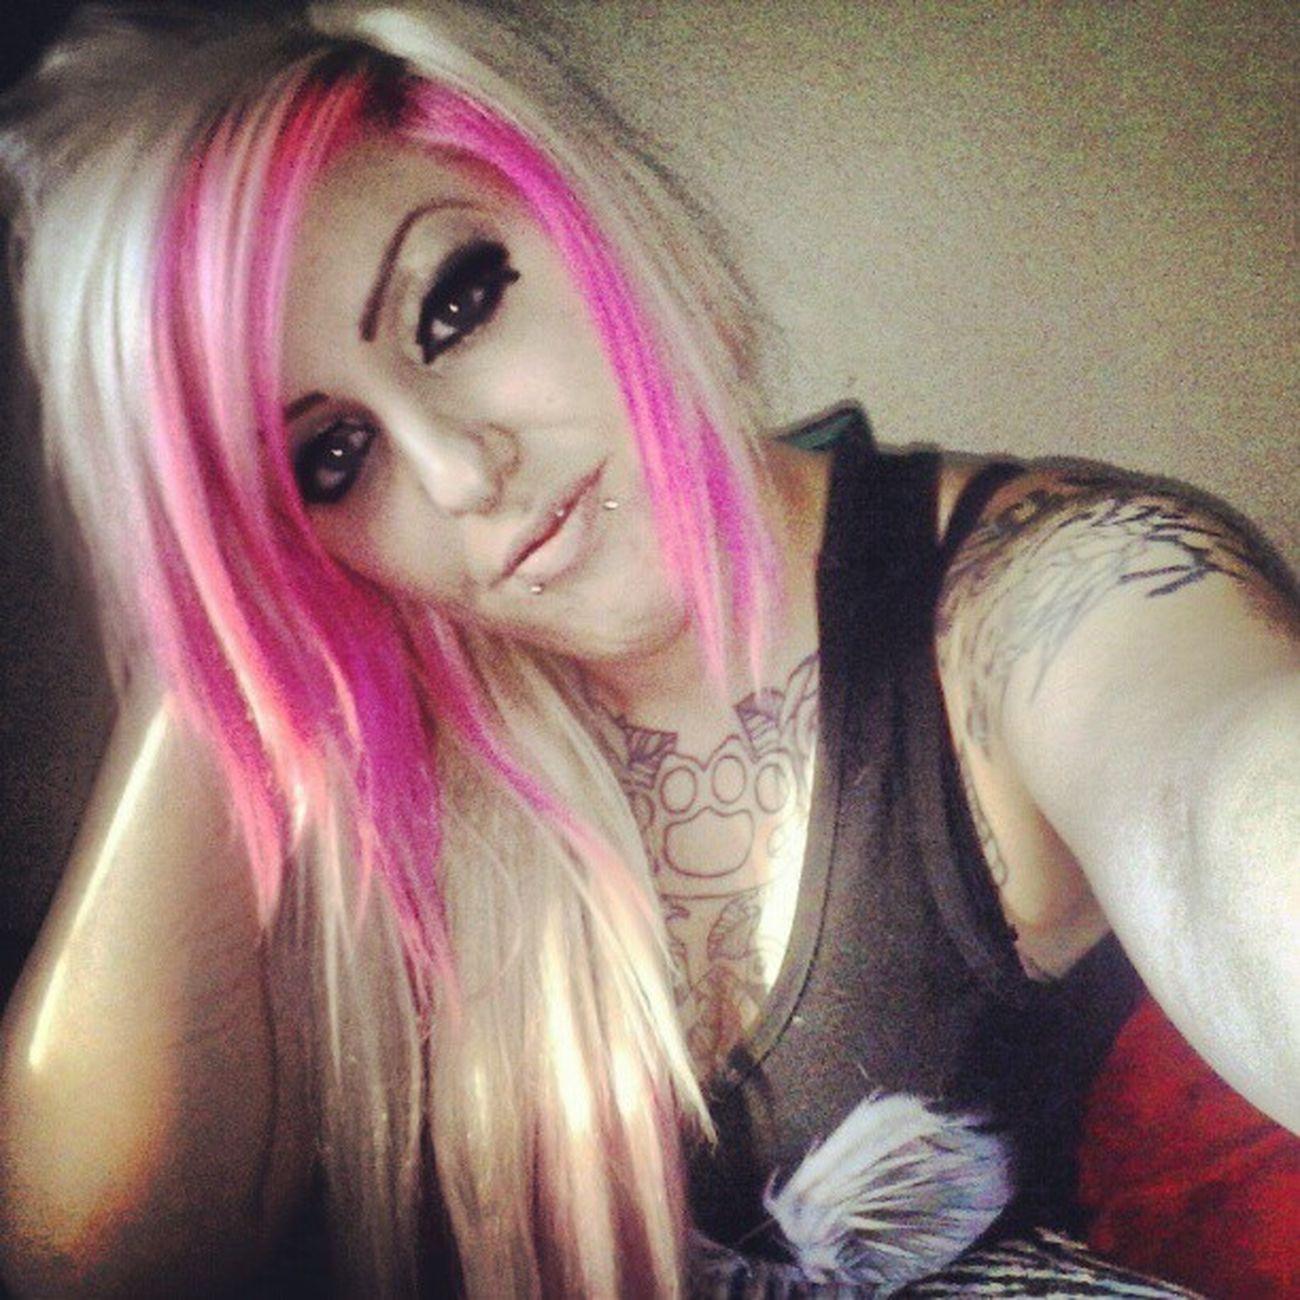 Tattoos Happygirl Girlswithtatoos Girlswithpiercings blondiepinkhair